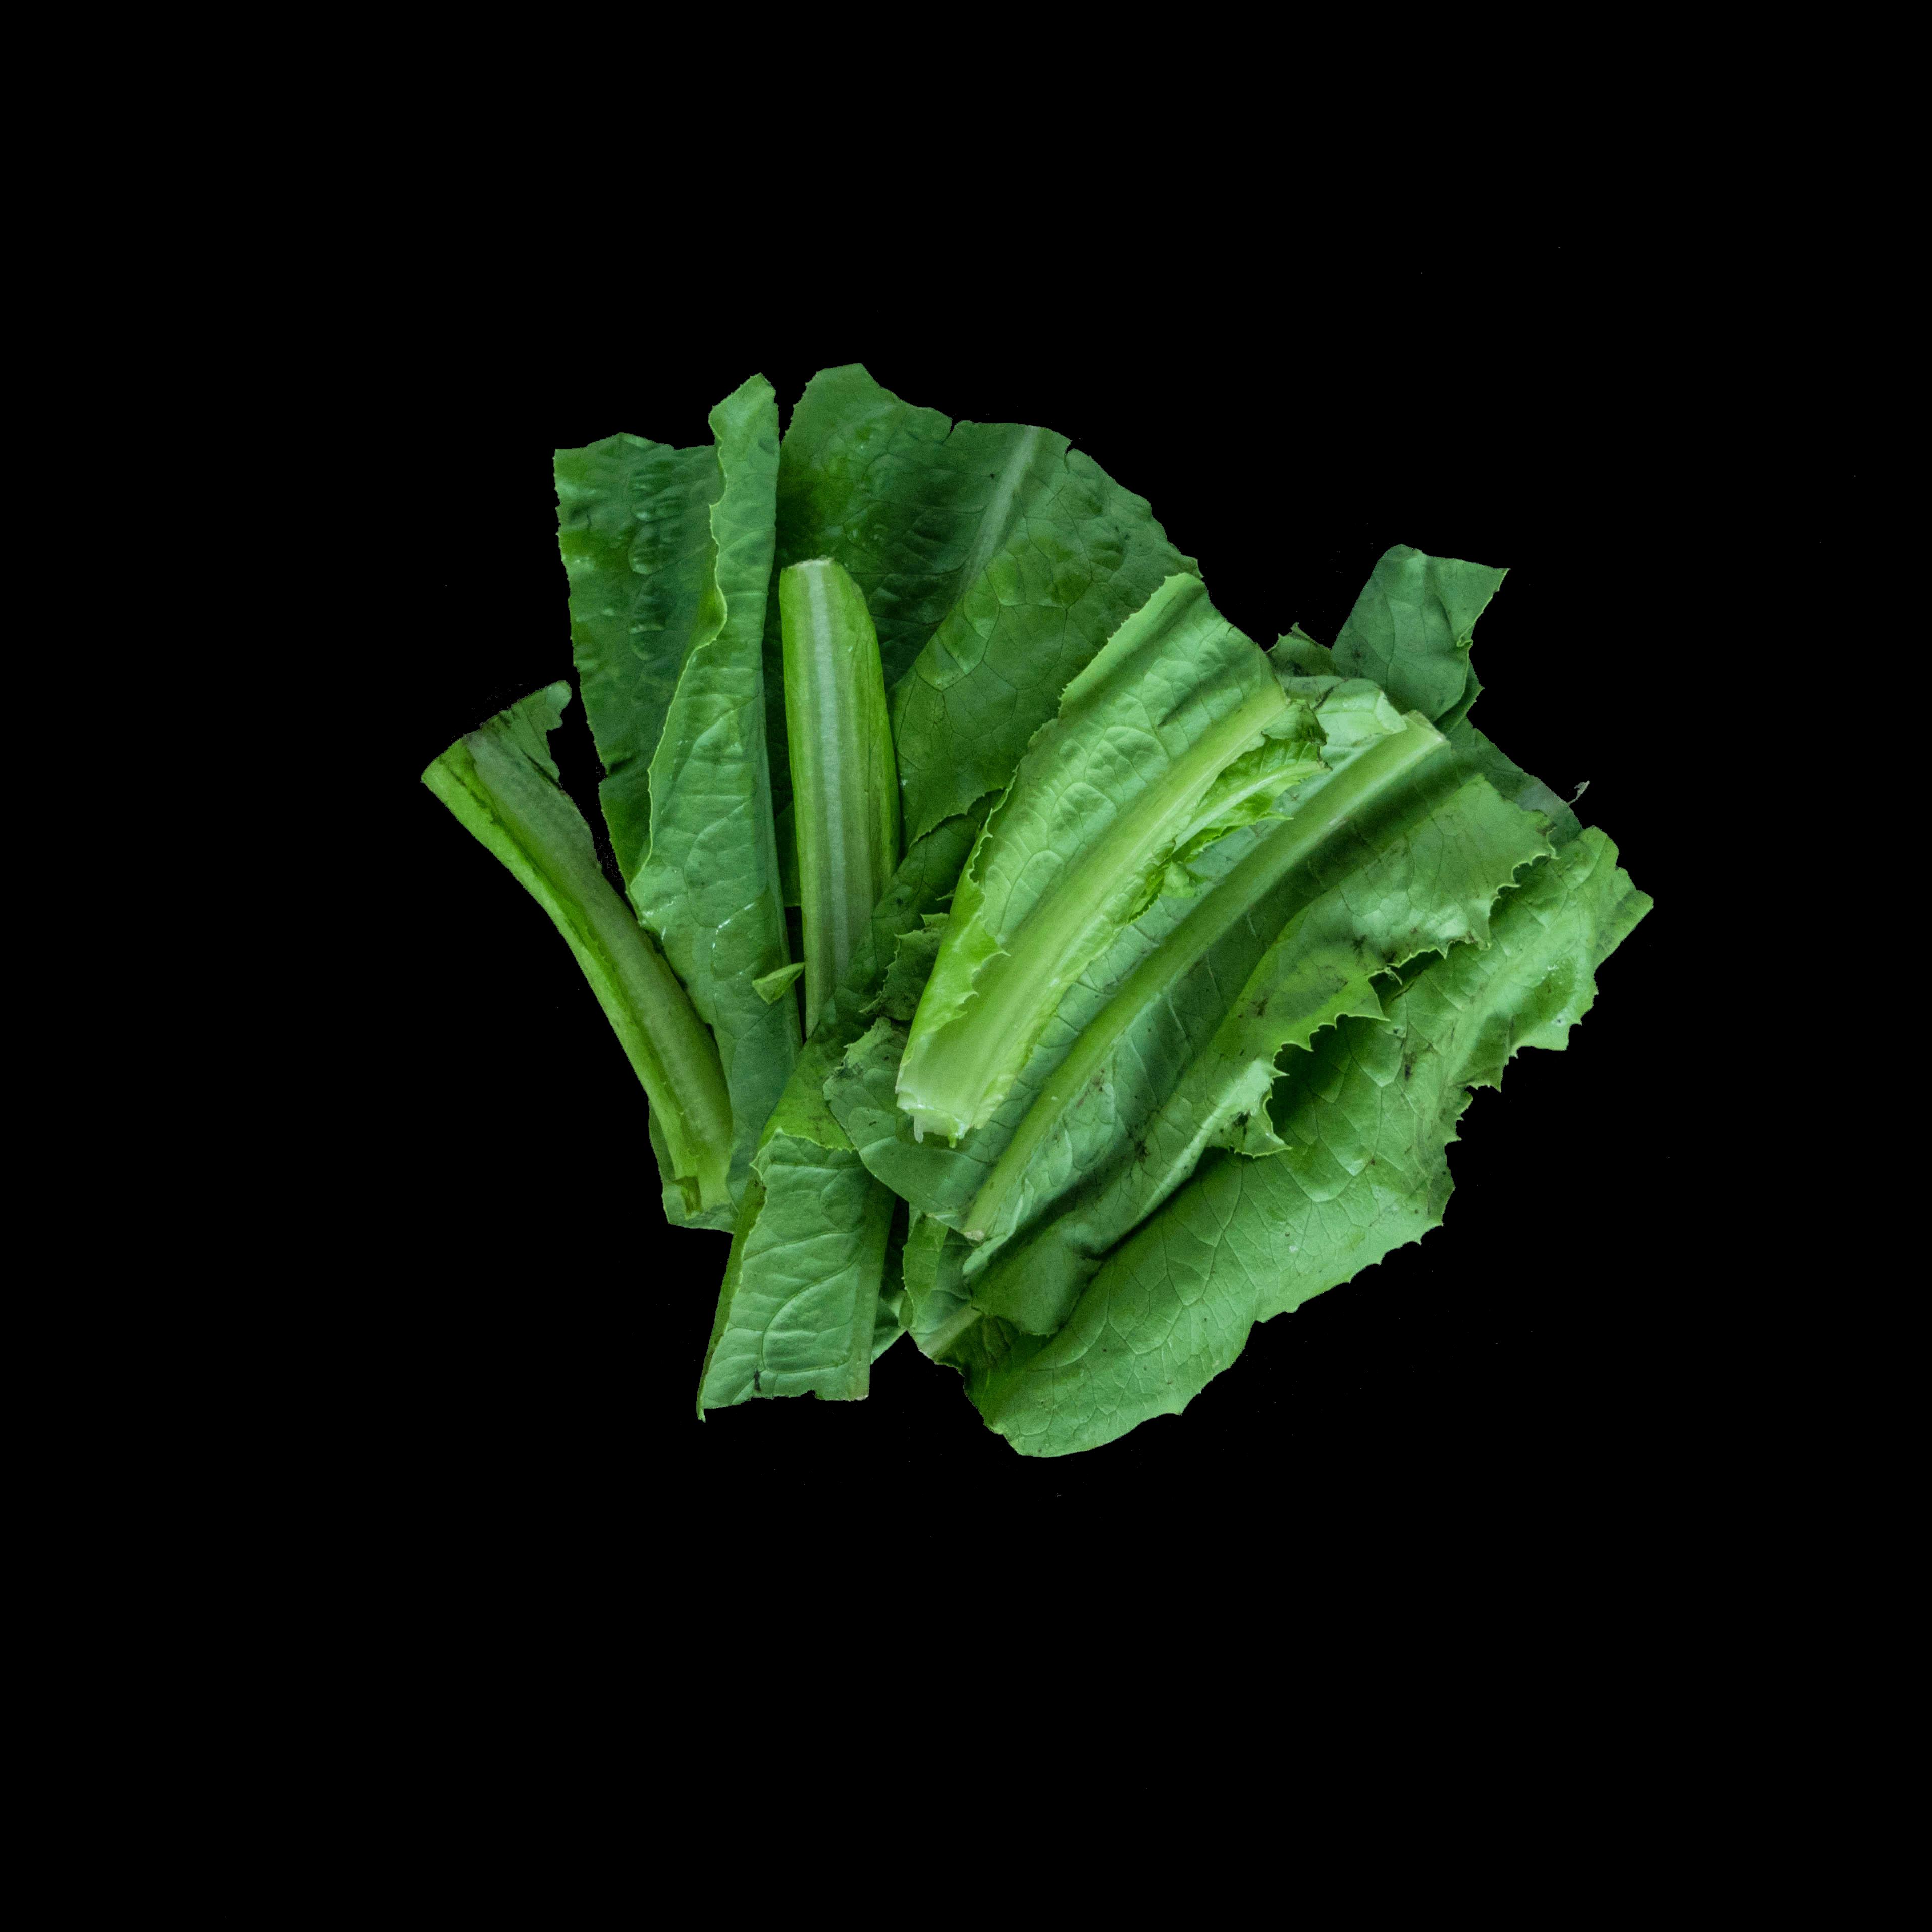 60. A菜 A Choy Image